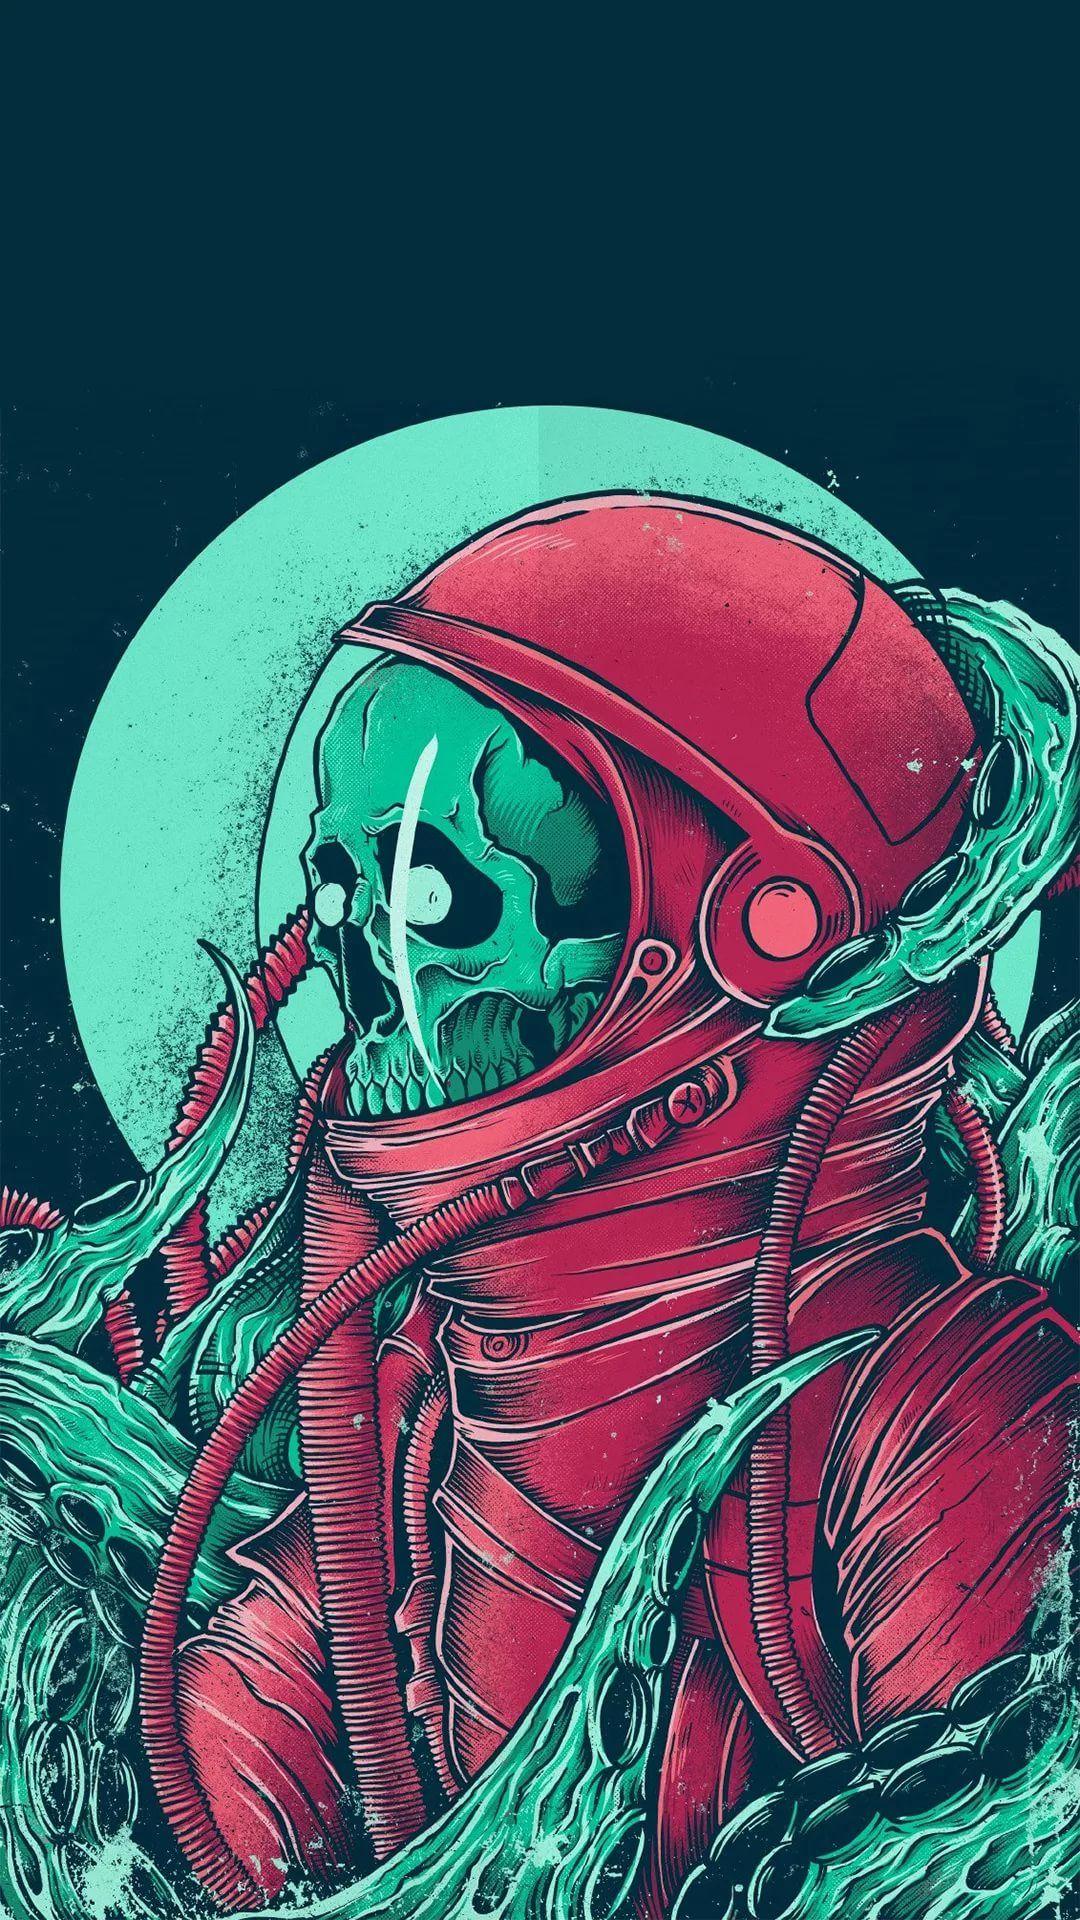 Skeleton wallpaper for Android